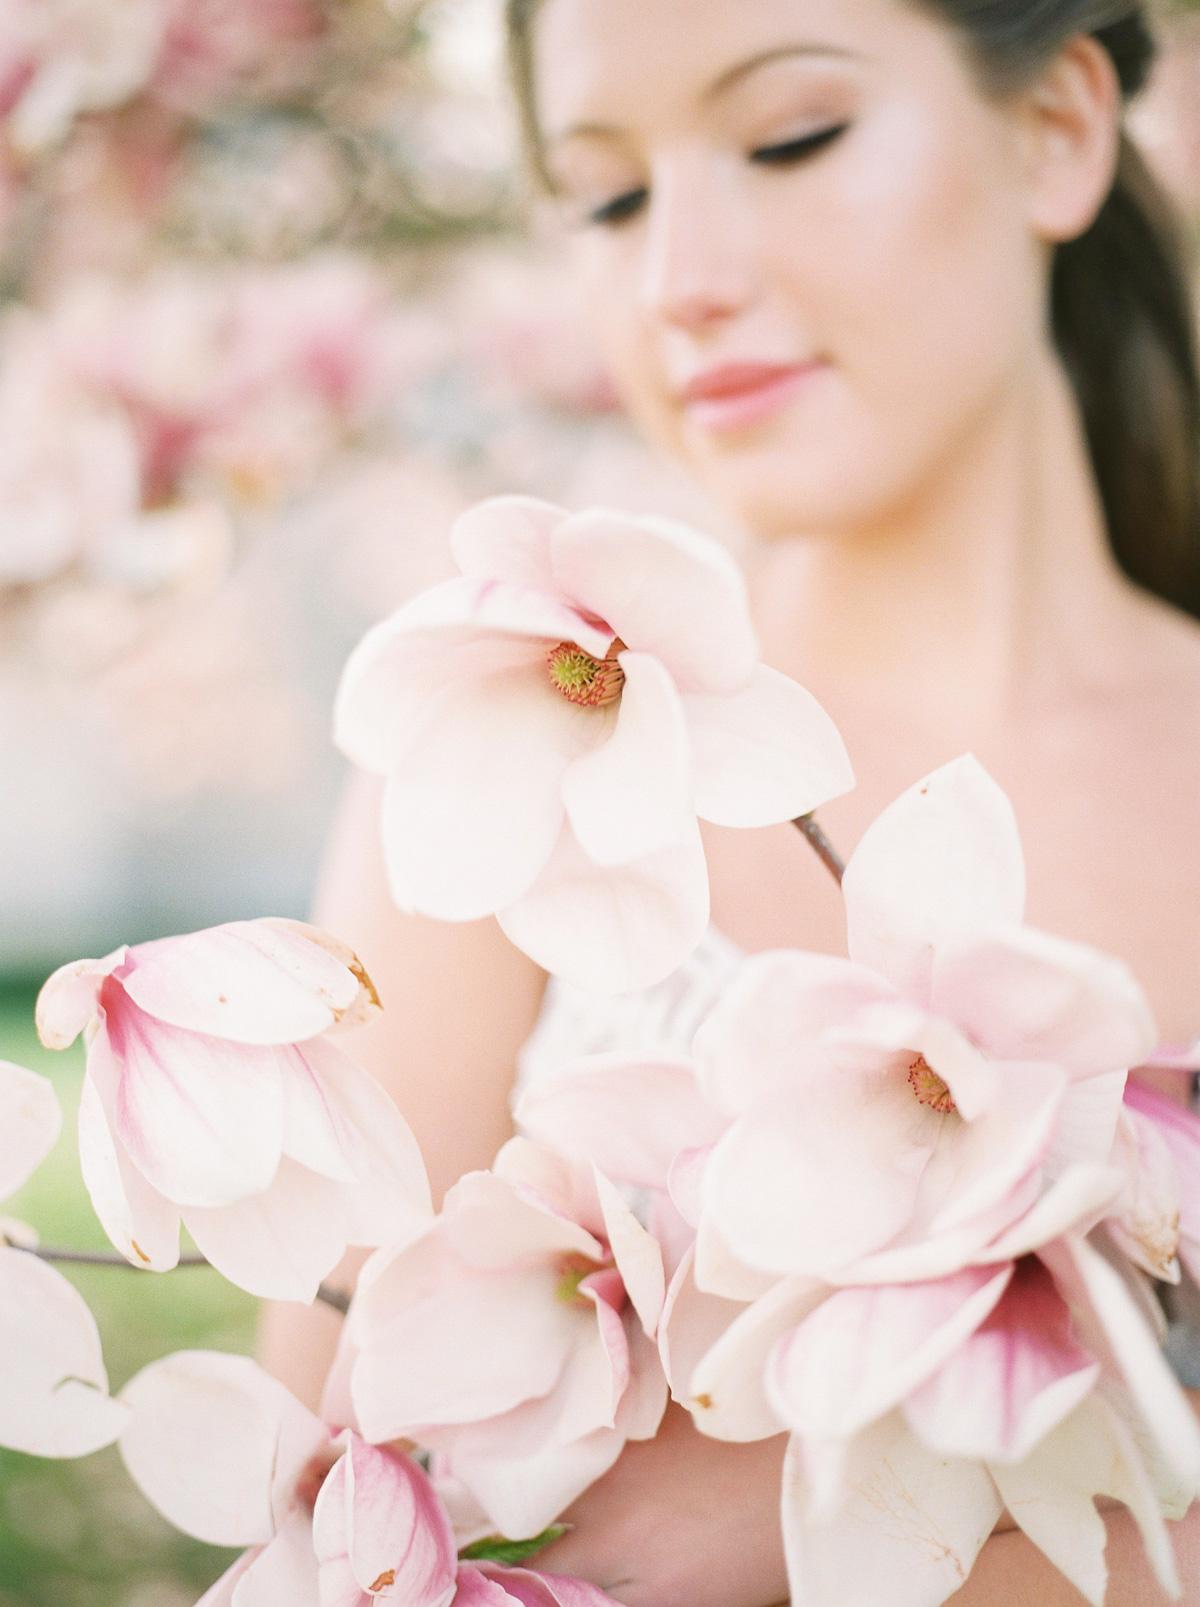 julia-park-photography-vineyard-bride-swish-list-niagara-on-the-lake-wedding-editorial-25.jpg